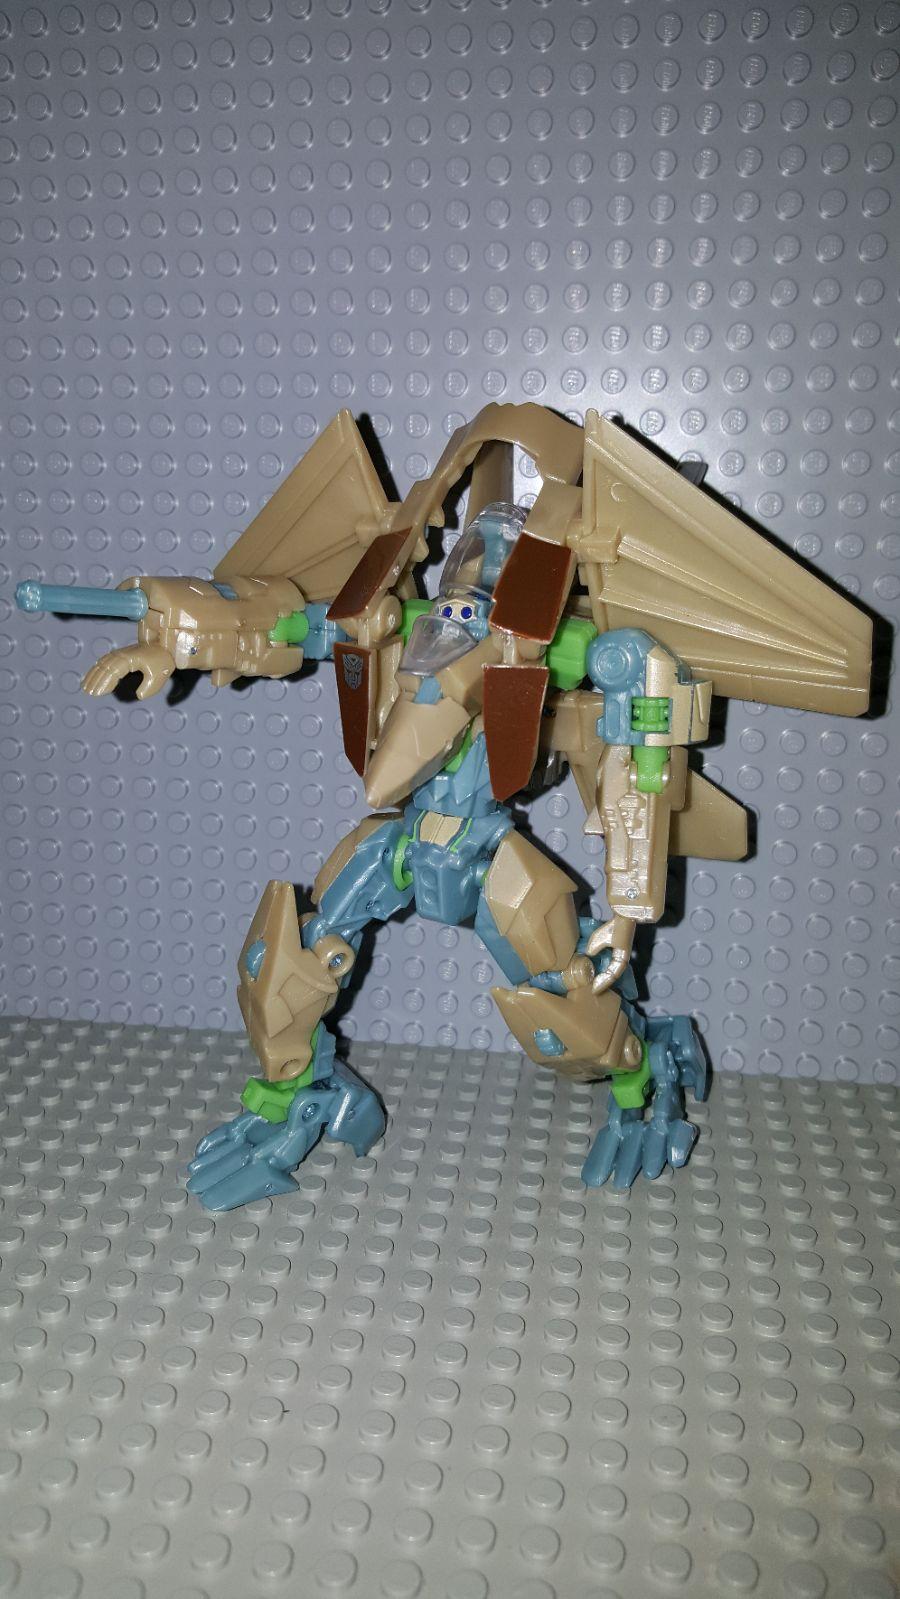 Autobot Breakaway Tan Variant